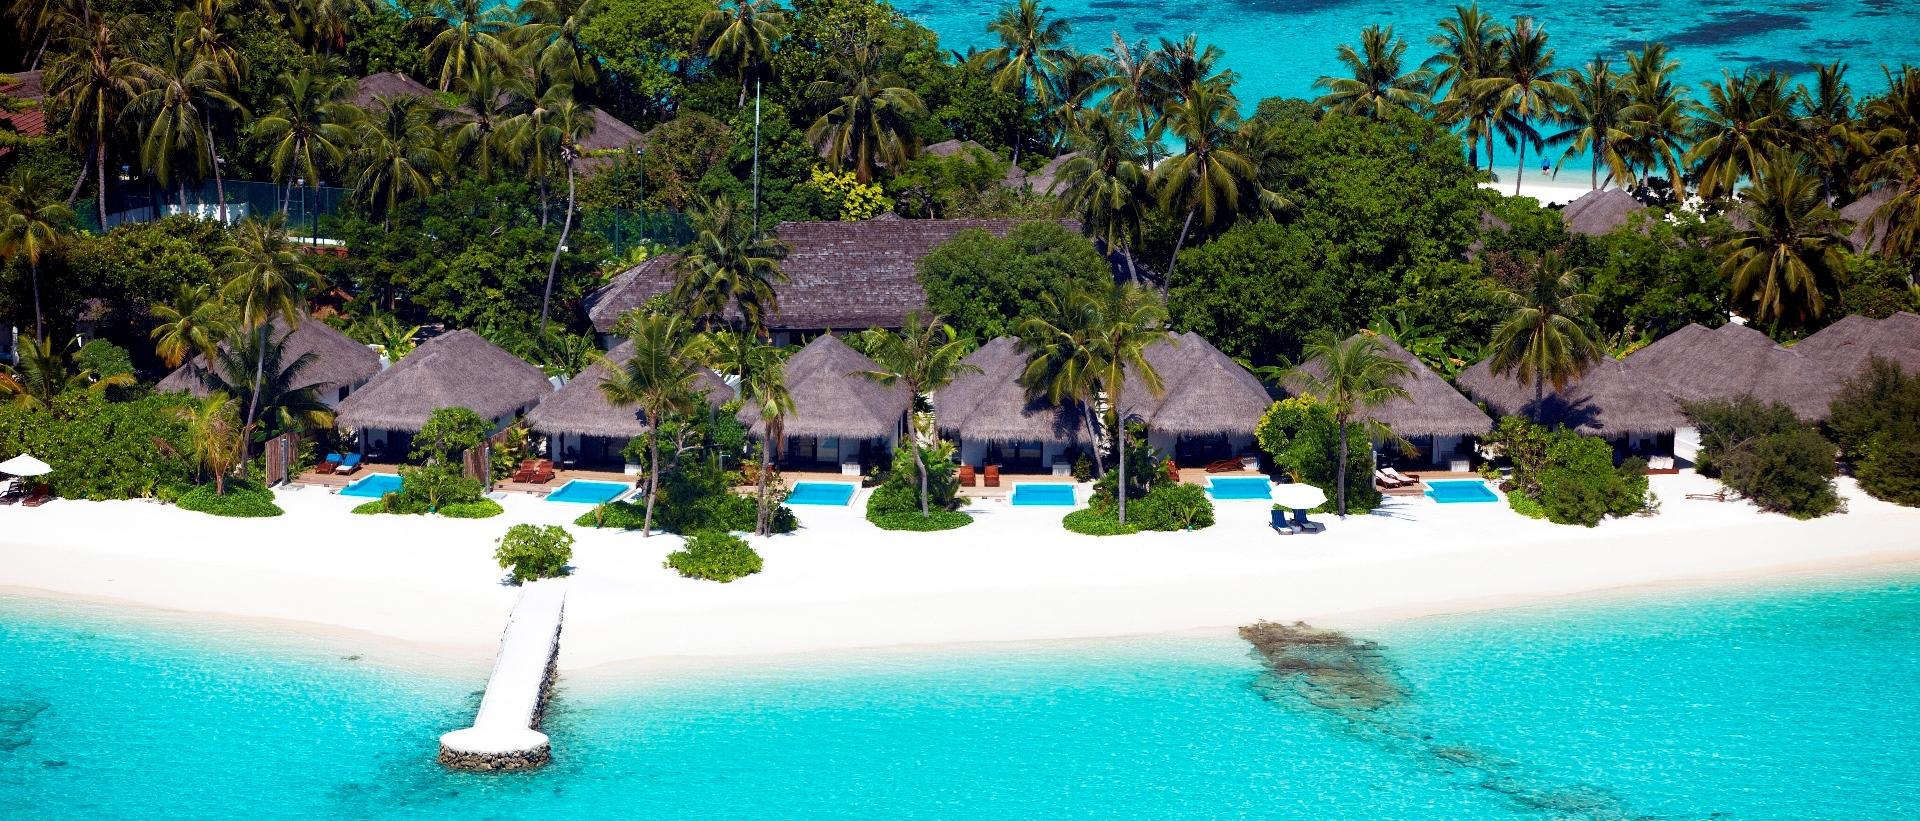 Velassaru Maldives Image